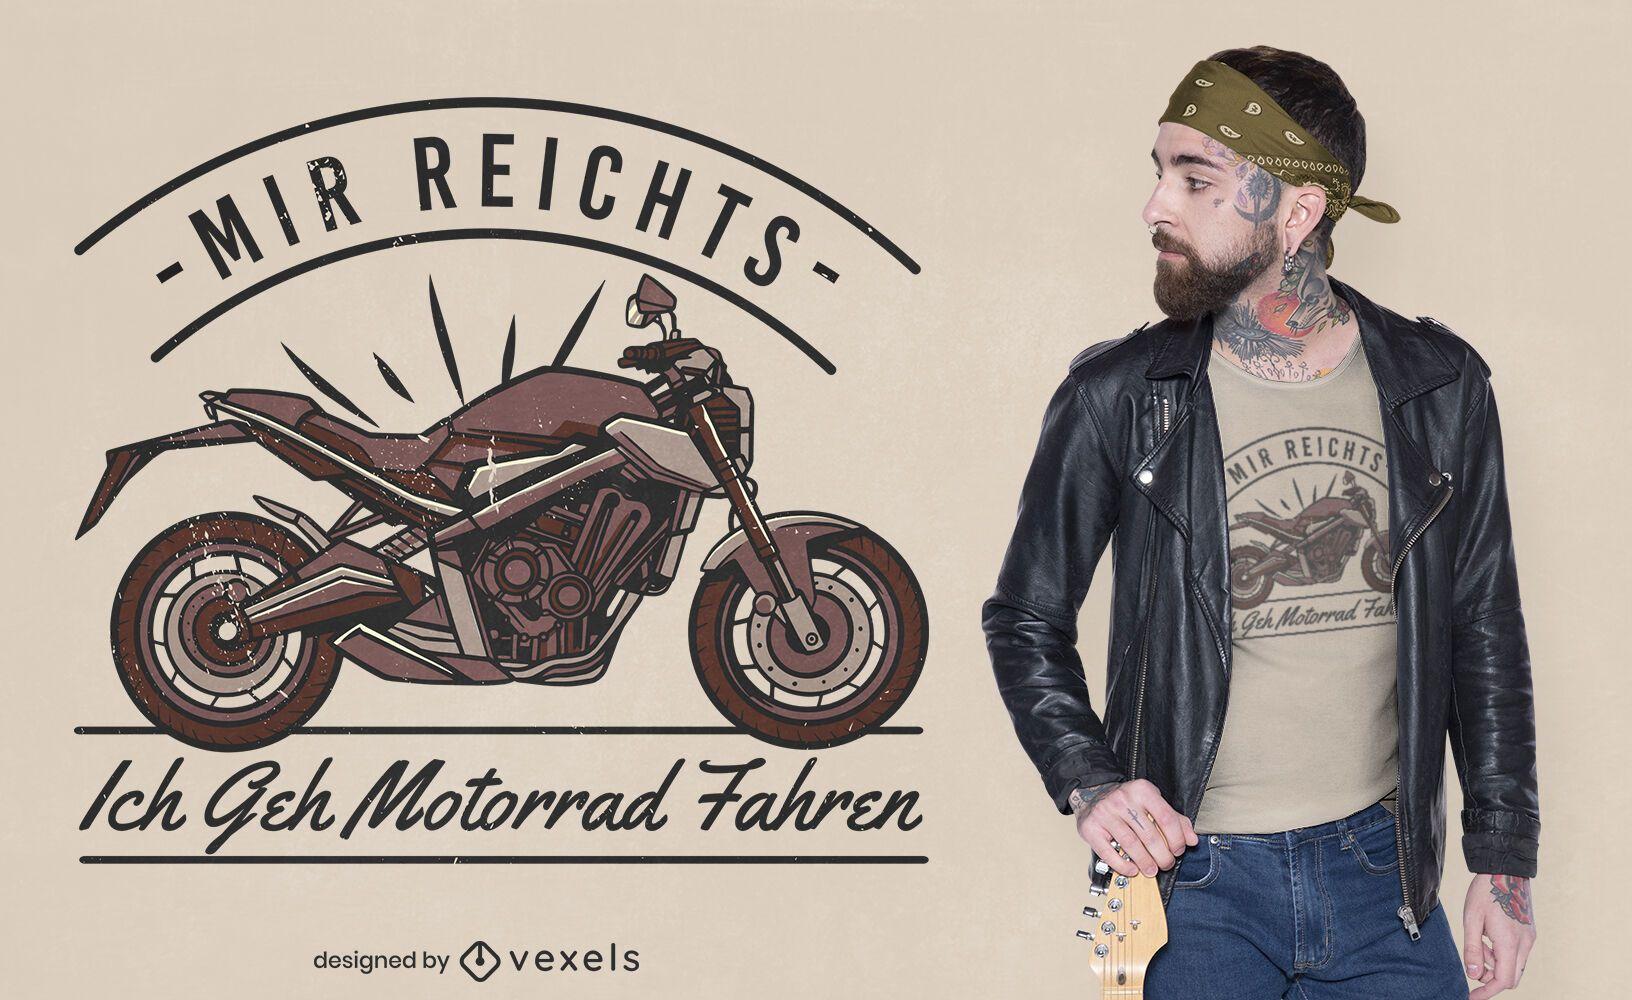 Vintage motorcycle ride t-shirt design